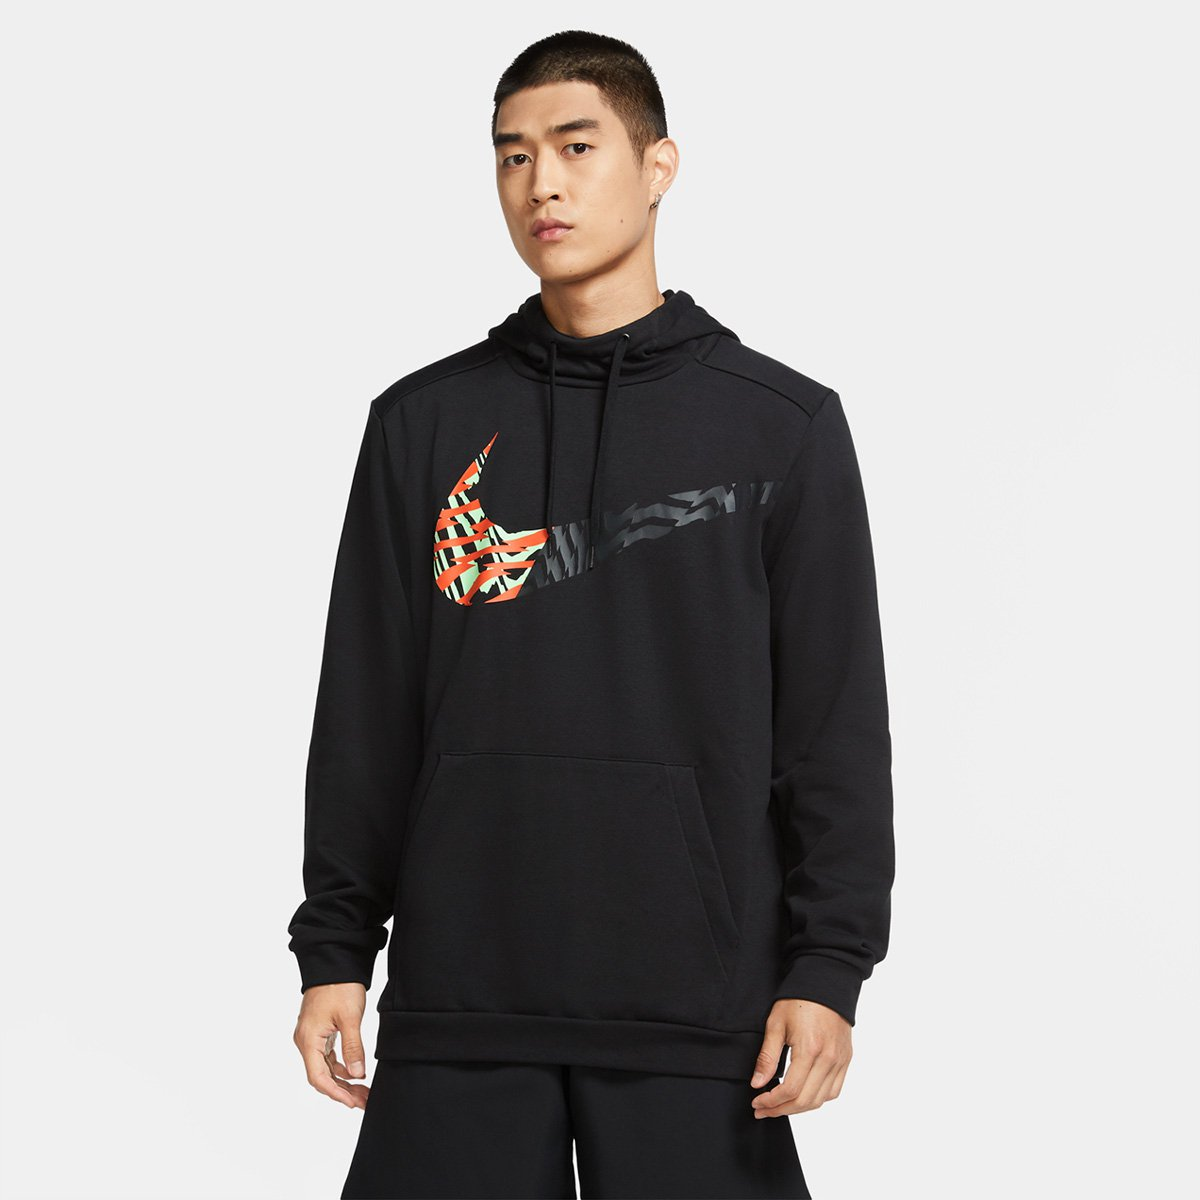 Moletom Nike Pullover Masculino